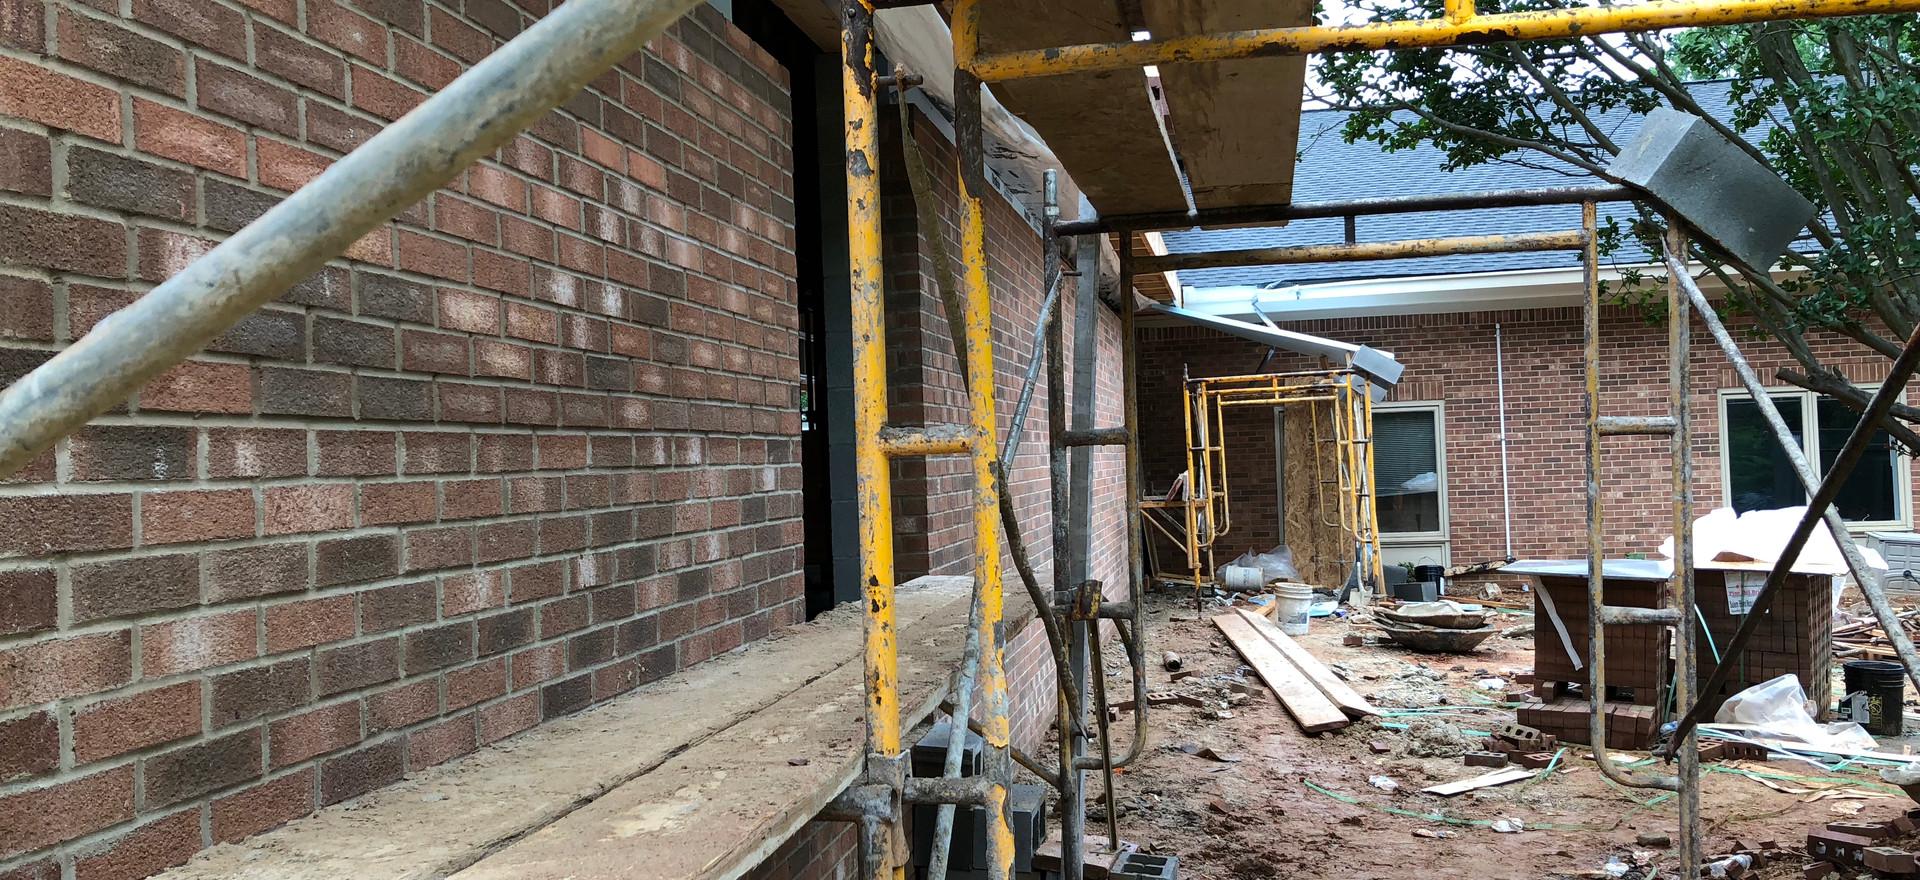 New Brick Work Looking Good